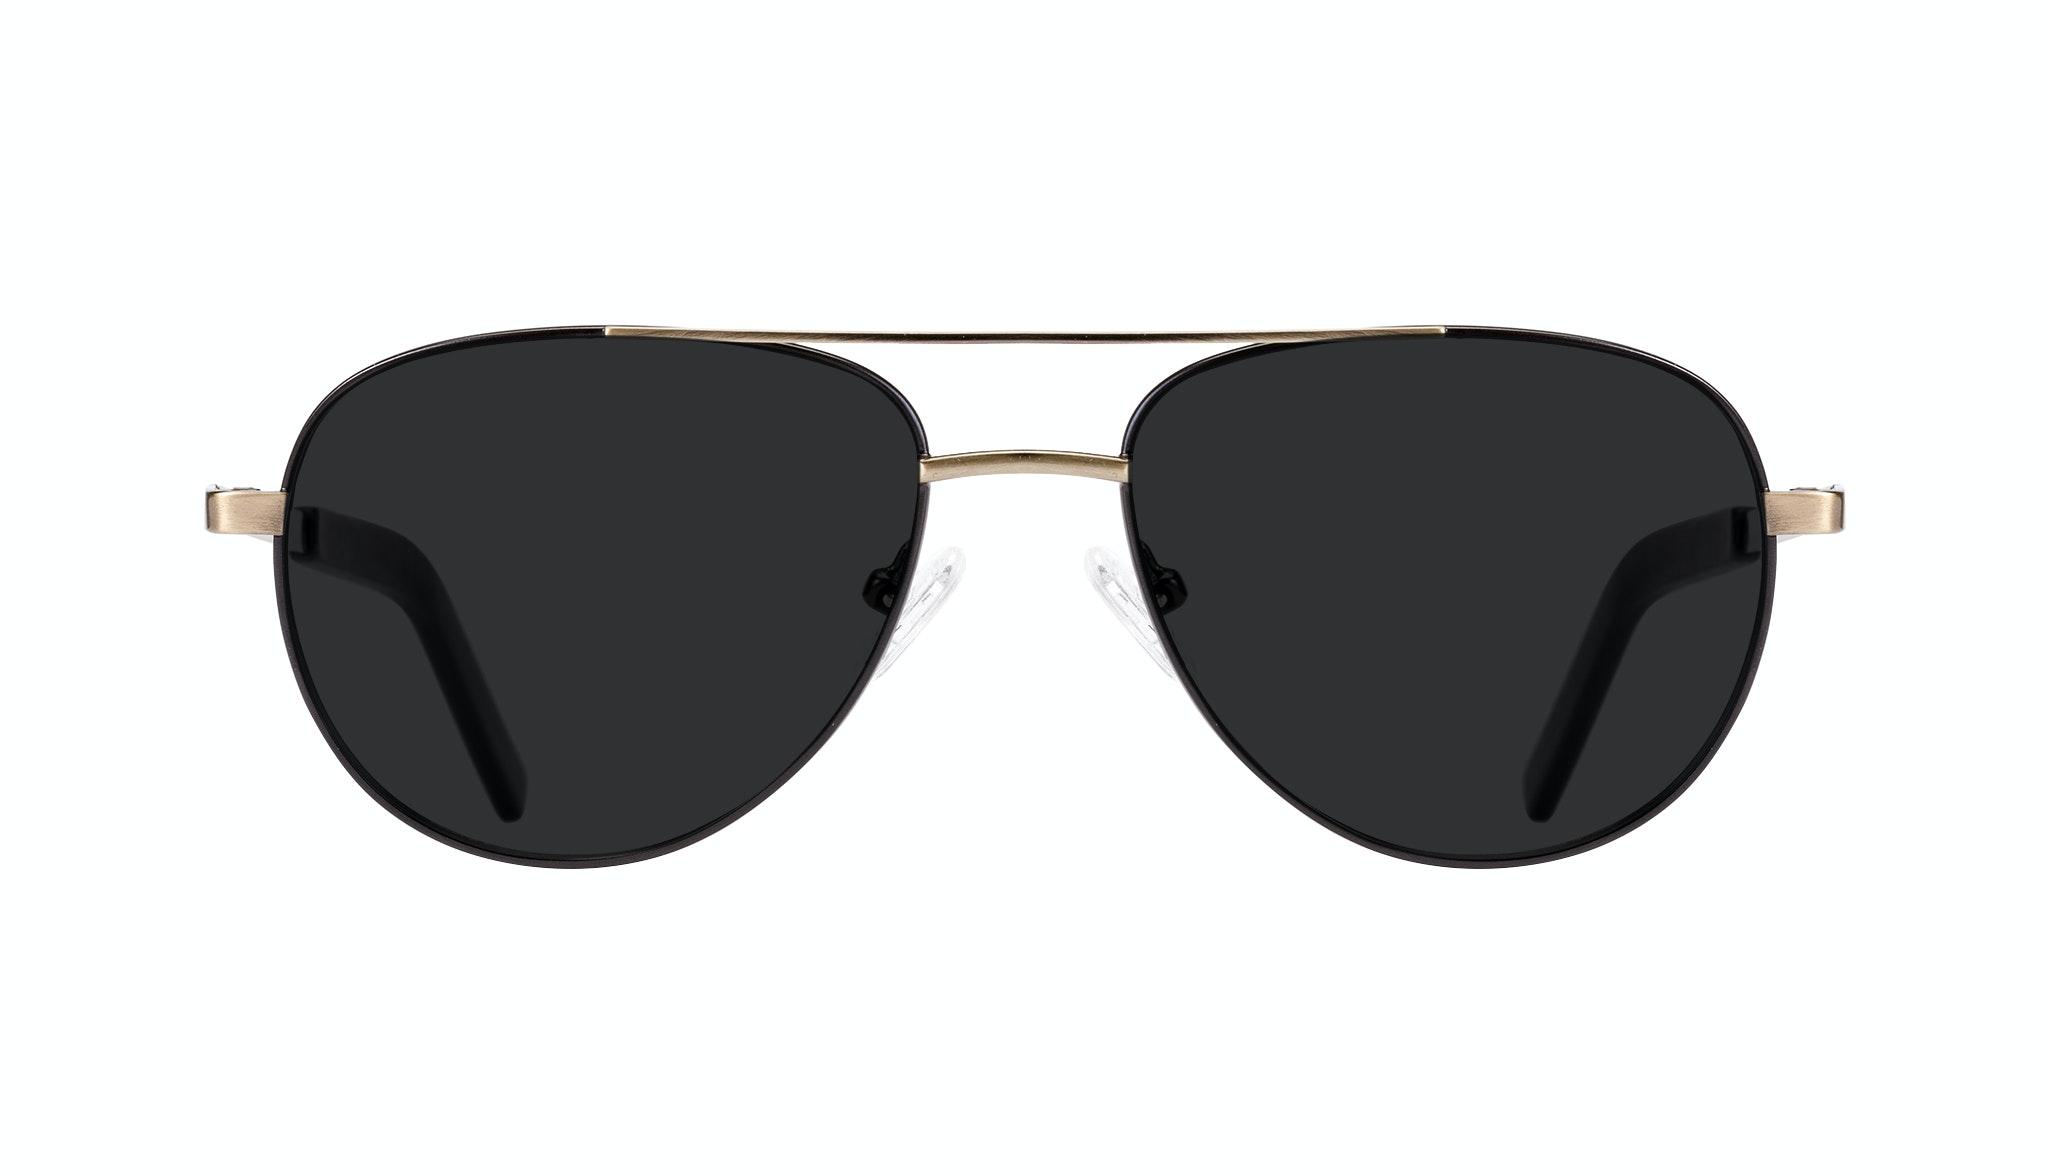 Affordable Fashion Glasses Aviator Sunglasses Men Devoted Deep Gold Front